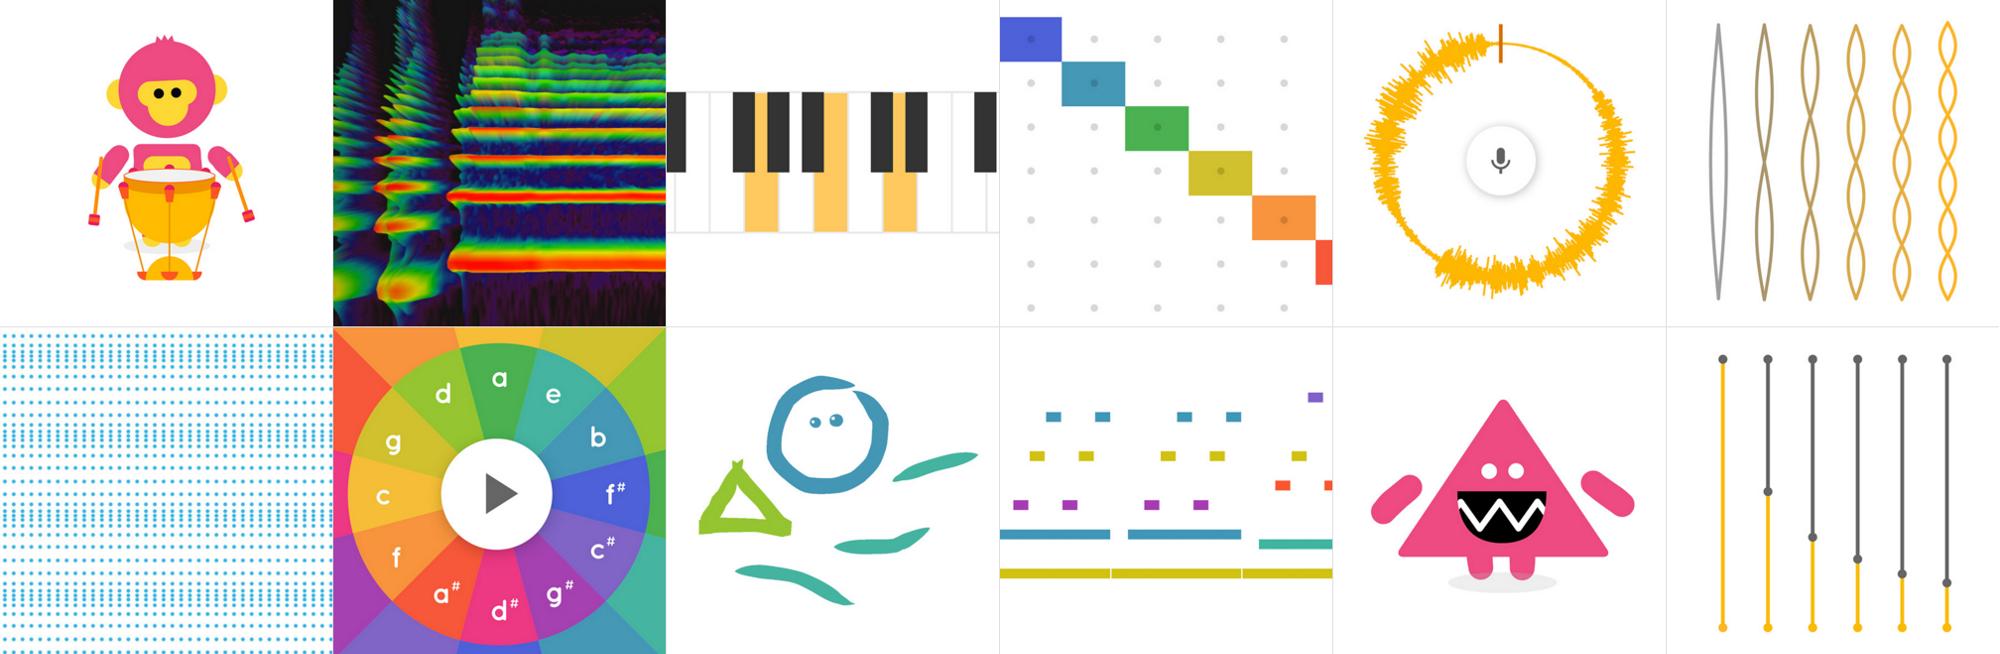 chrome-music-lab-thumbnails.png